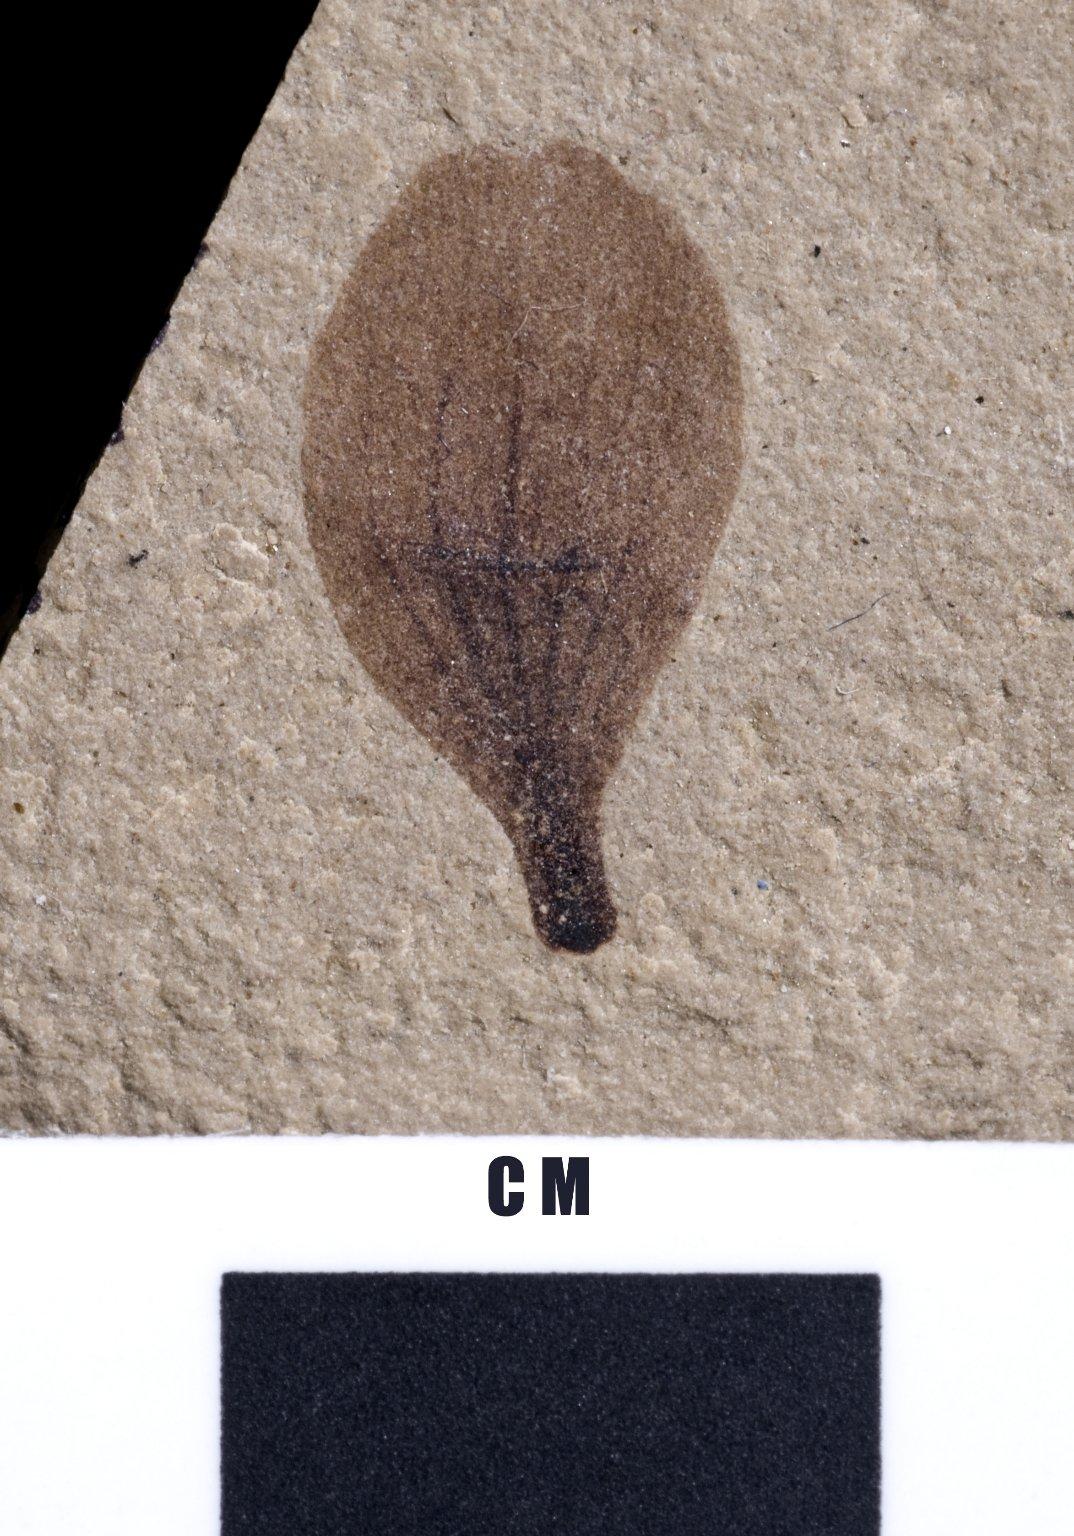 Parvileguminophyllum coloradensis